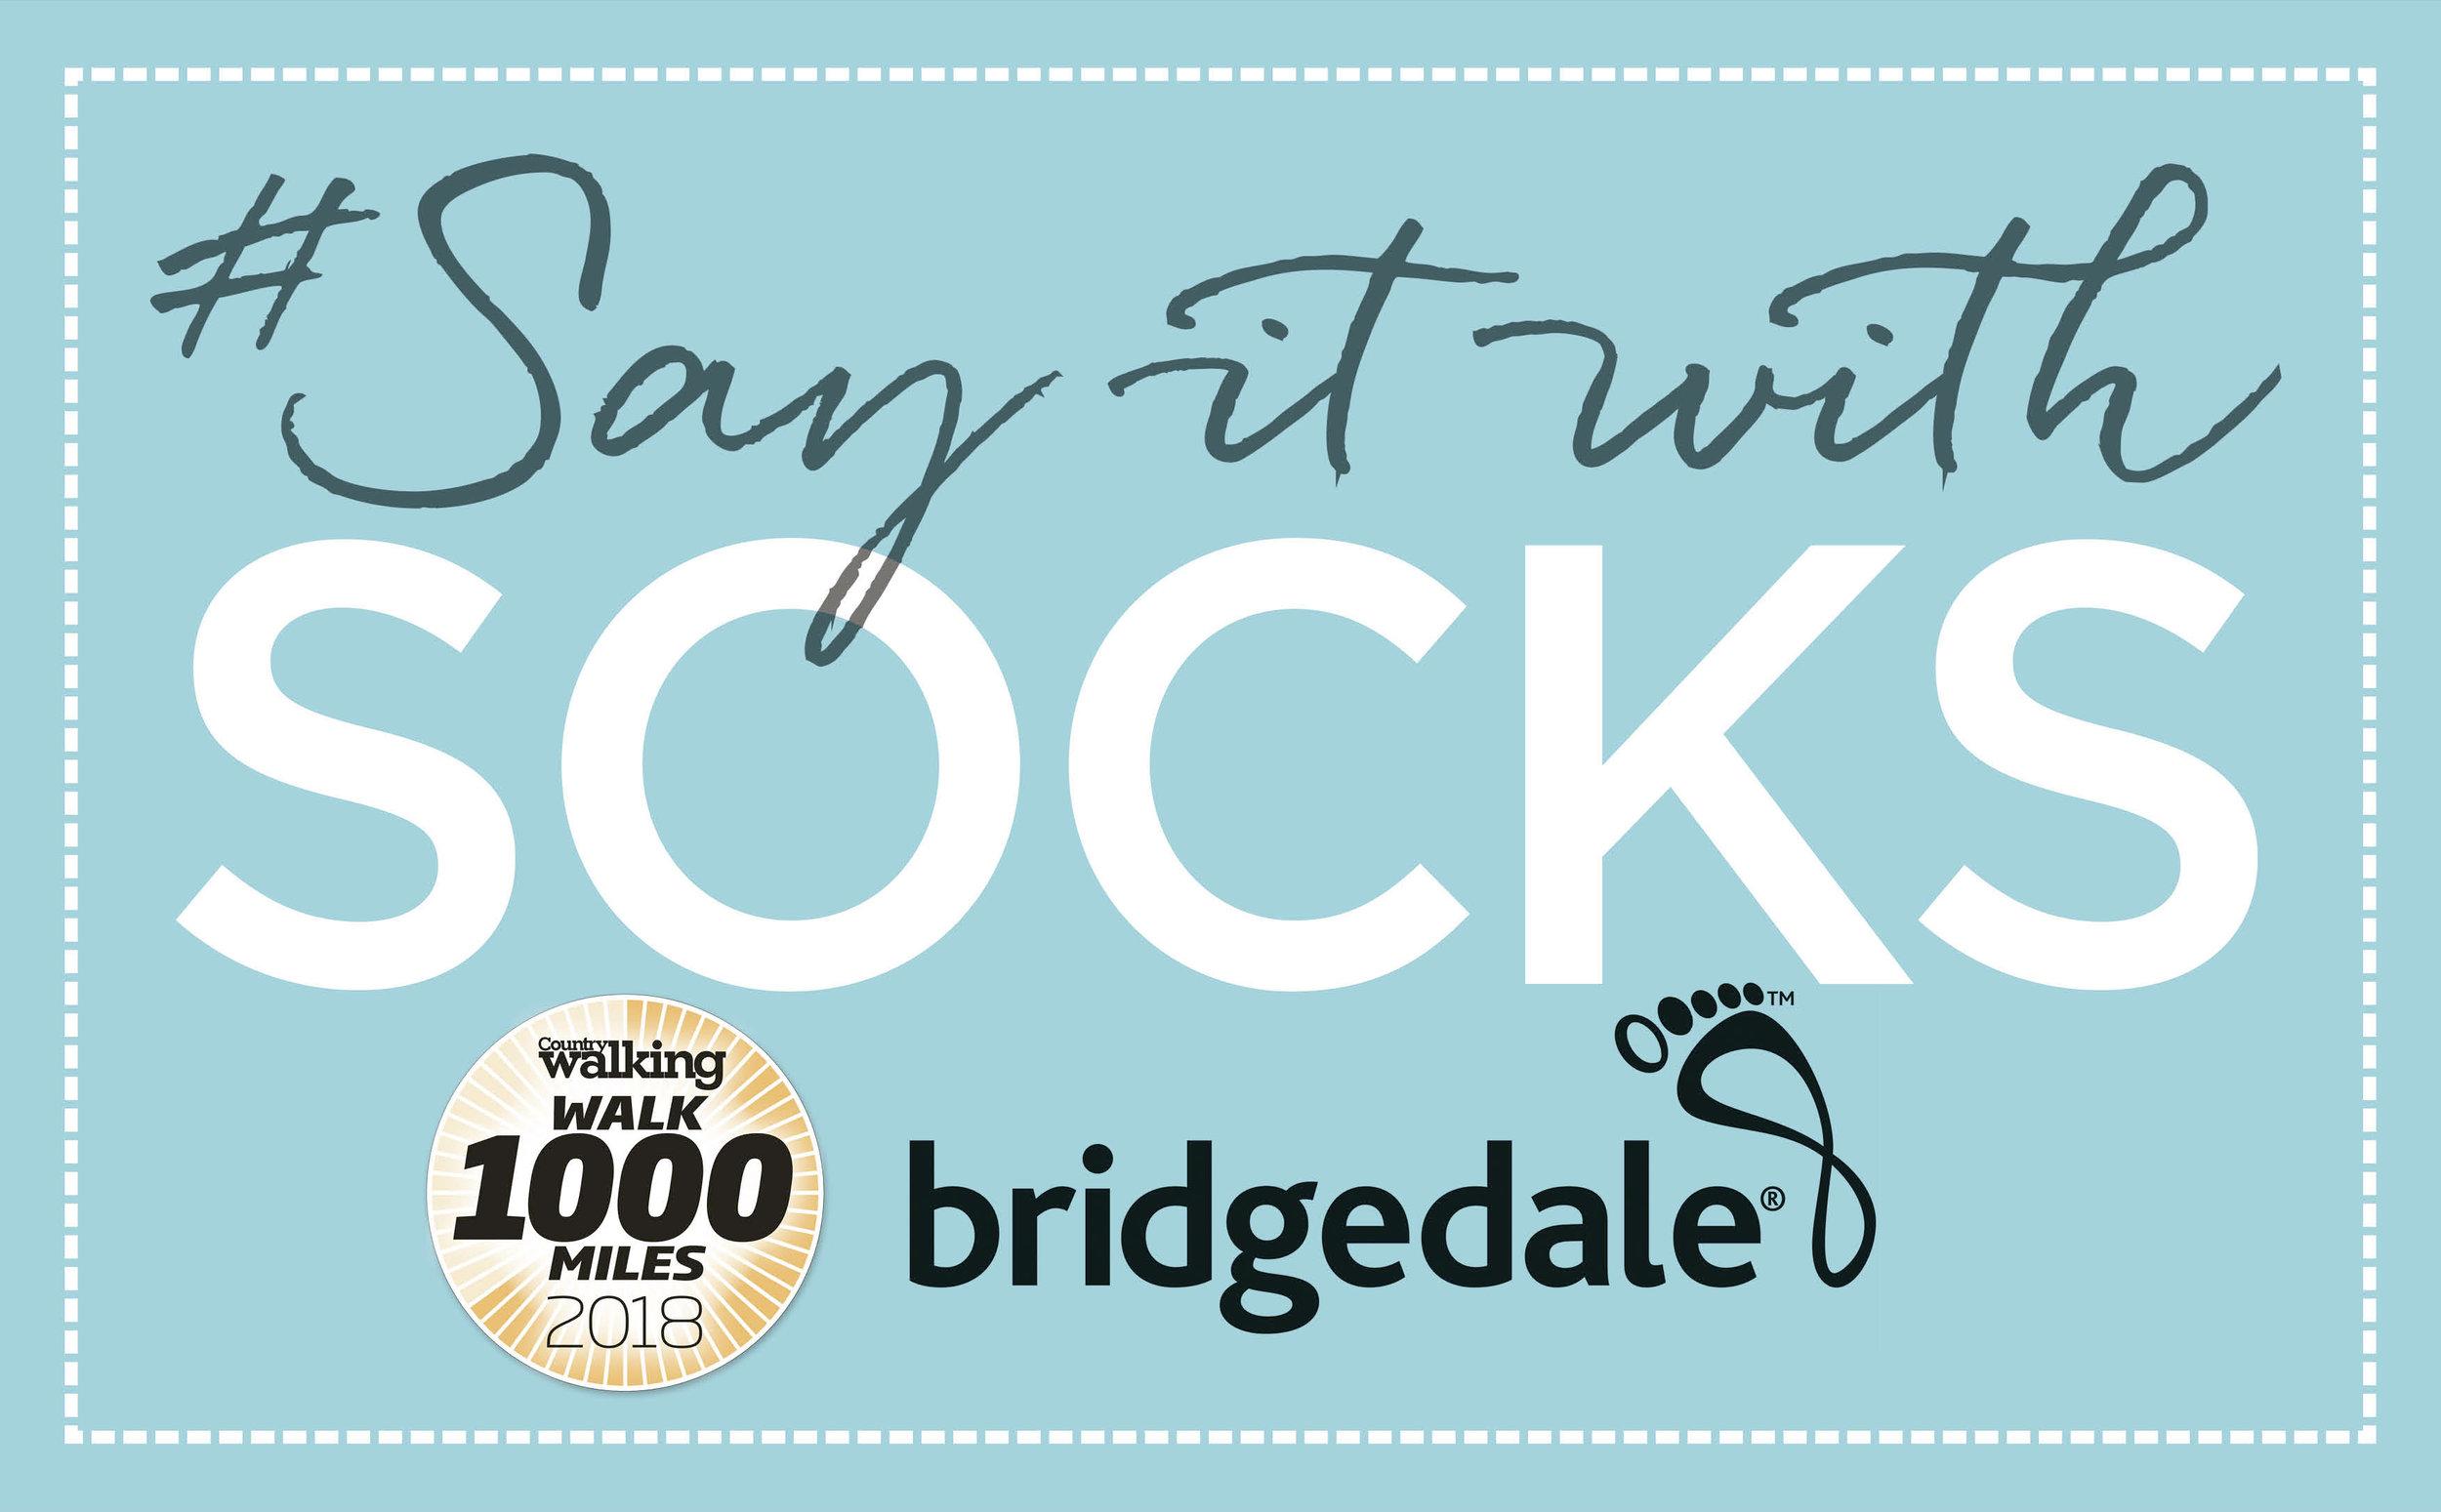 Say it with socks logo MASSIVE.jpg